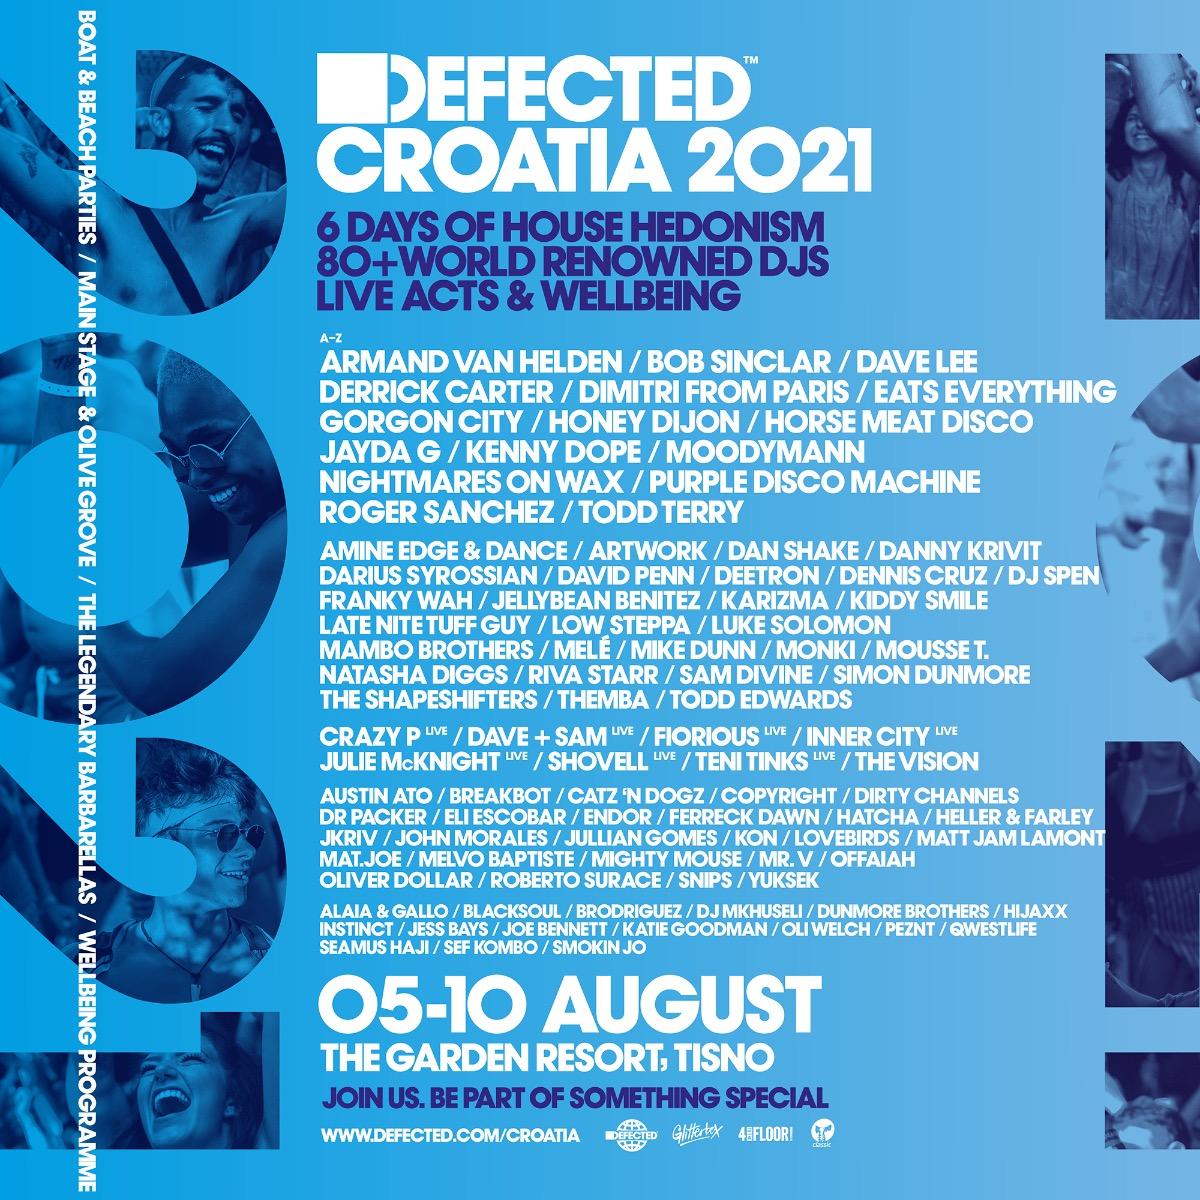 Defected Croatia 2021